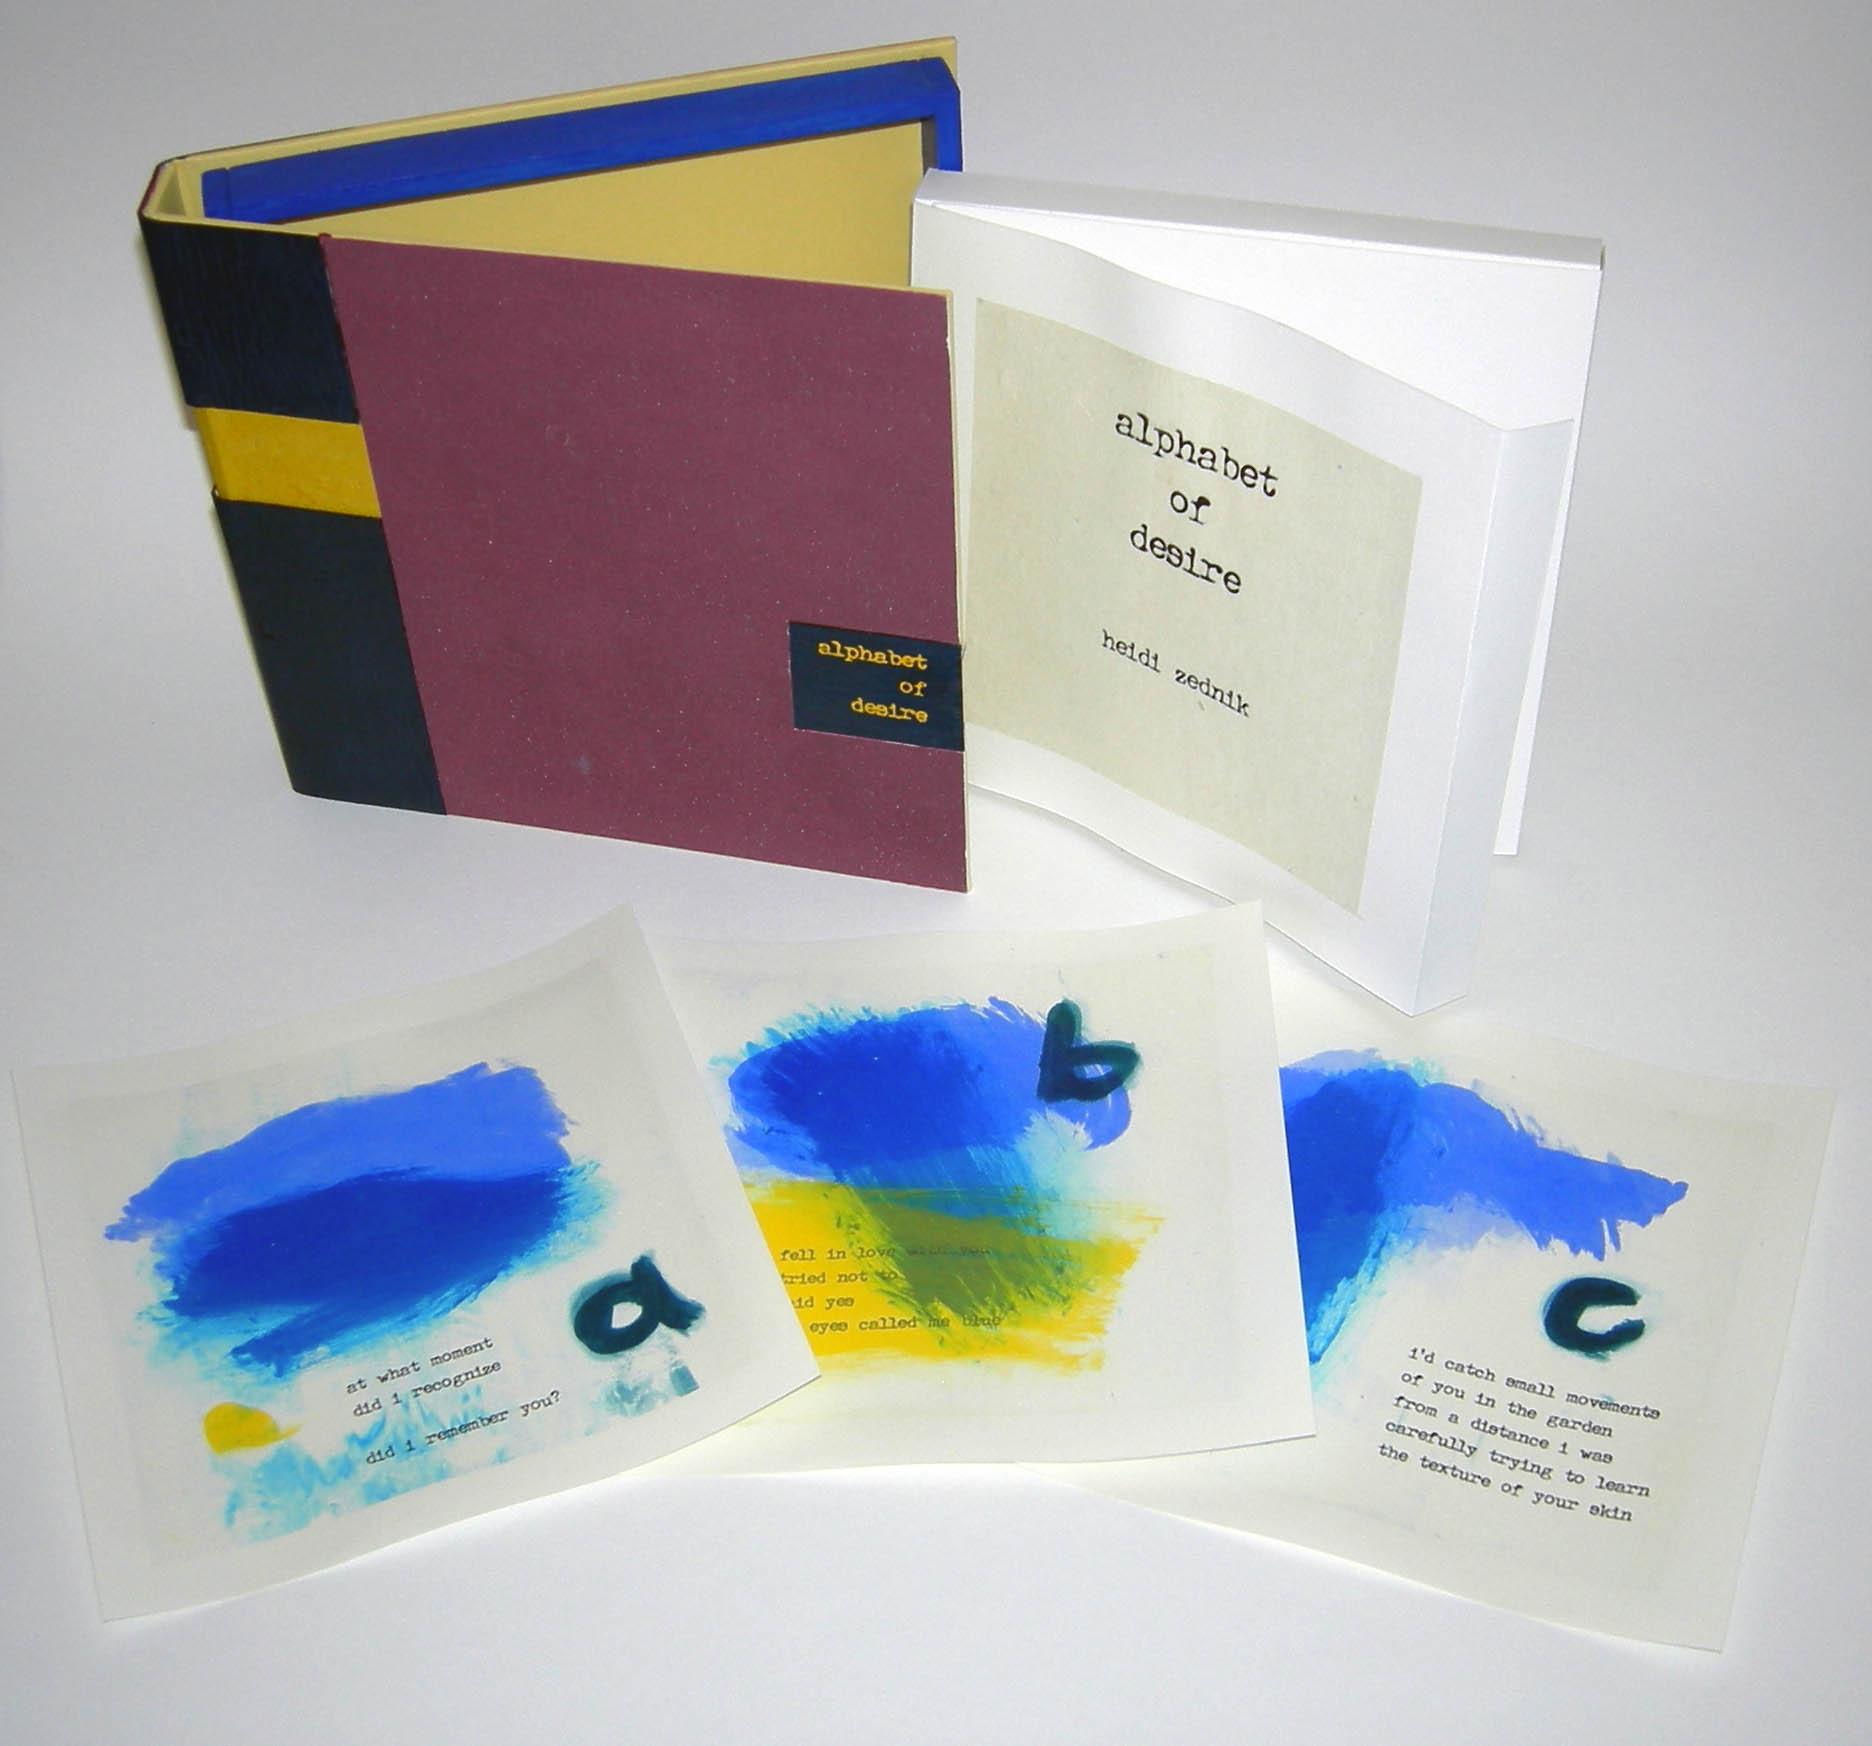 Alphabet of Desire – Boxed version – 2006